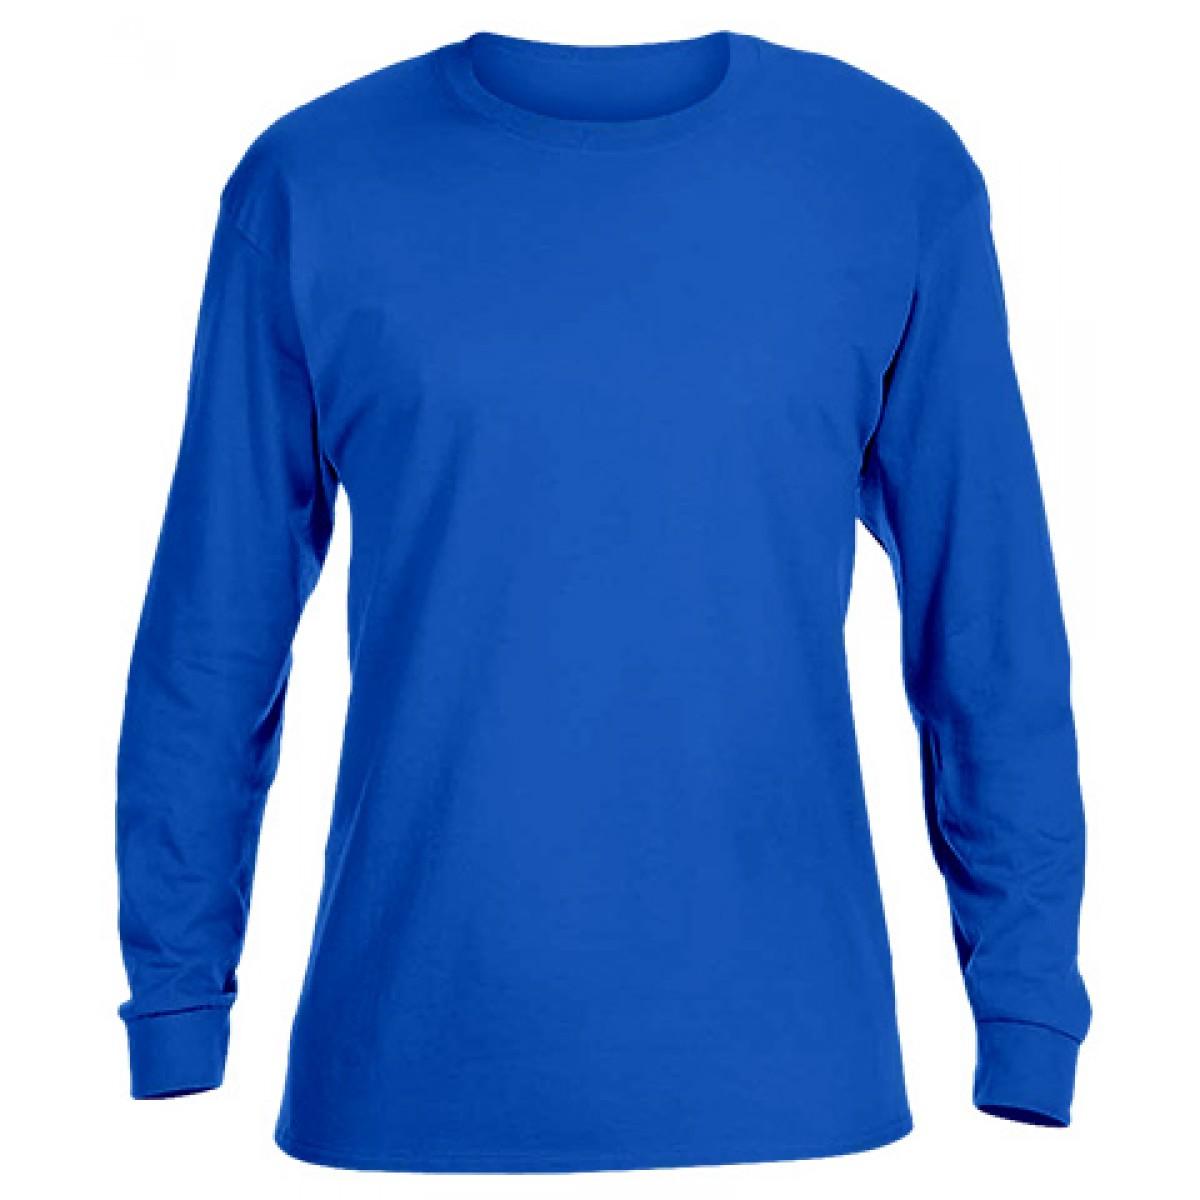 Basic Long Sleeve Crew Neck -Royal Blue-L